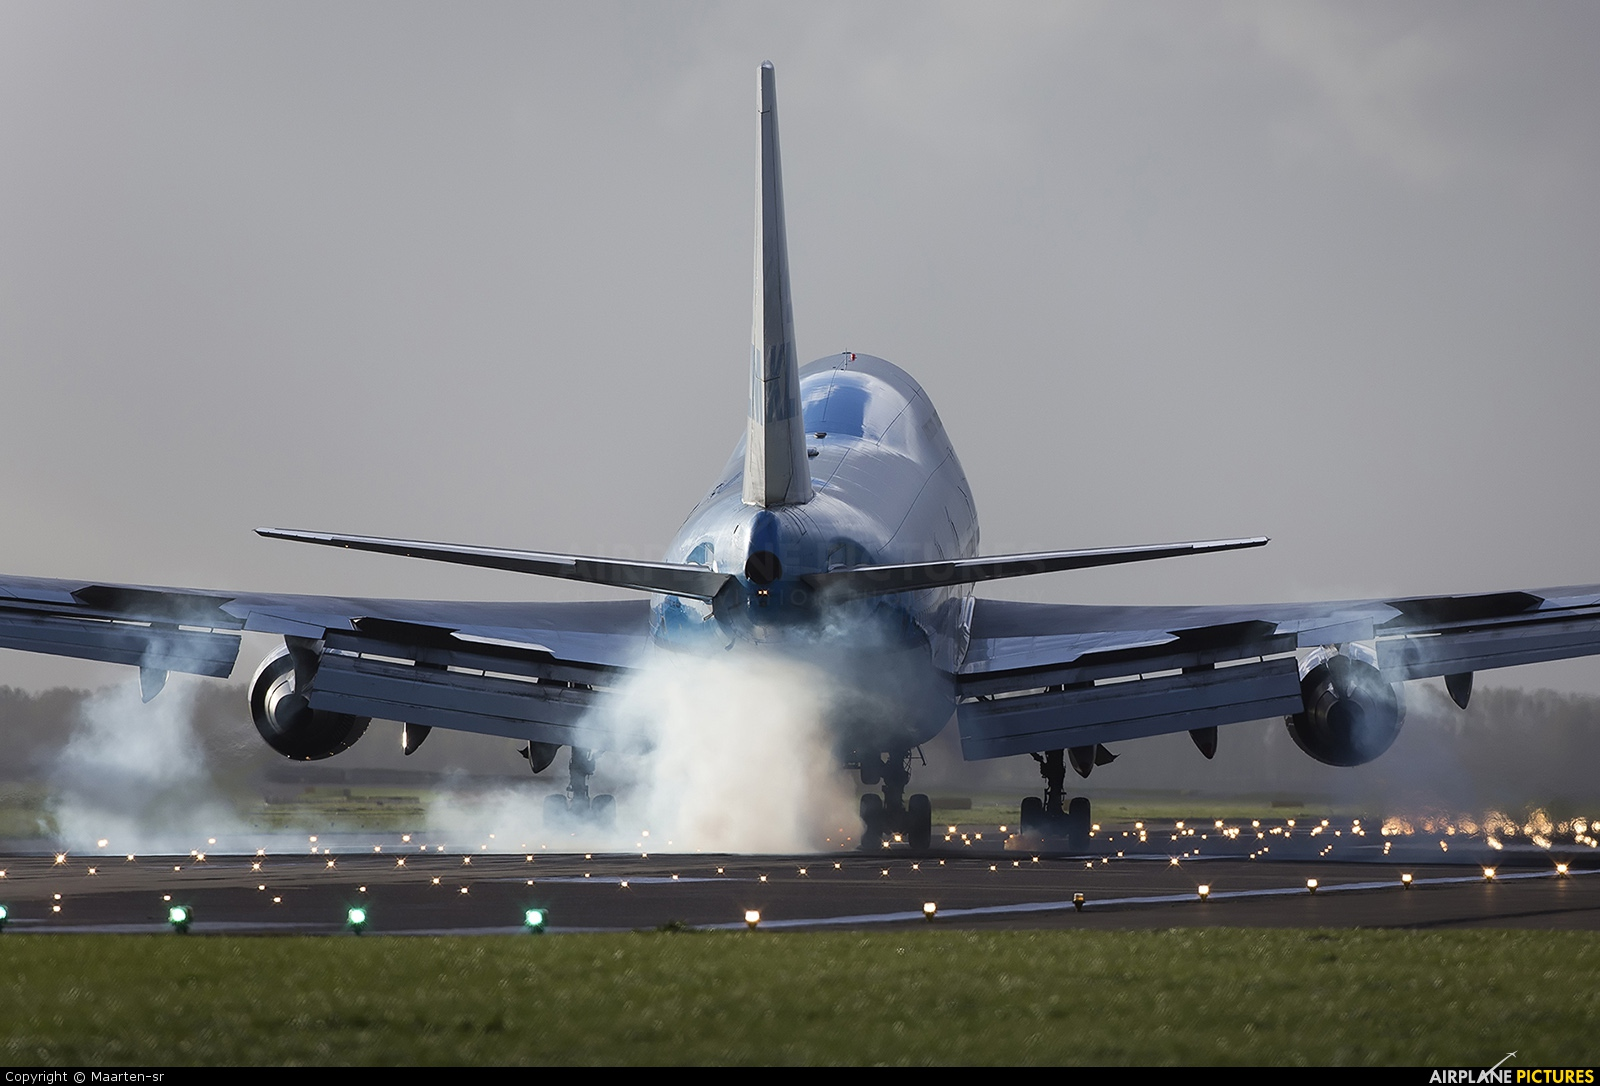 KLM - aircraft at Amsterdam - Schiphol